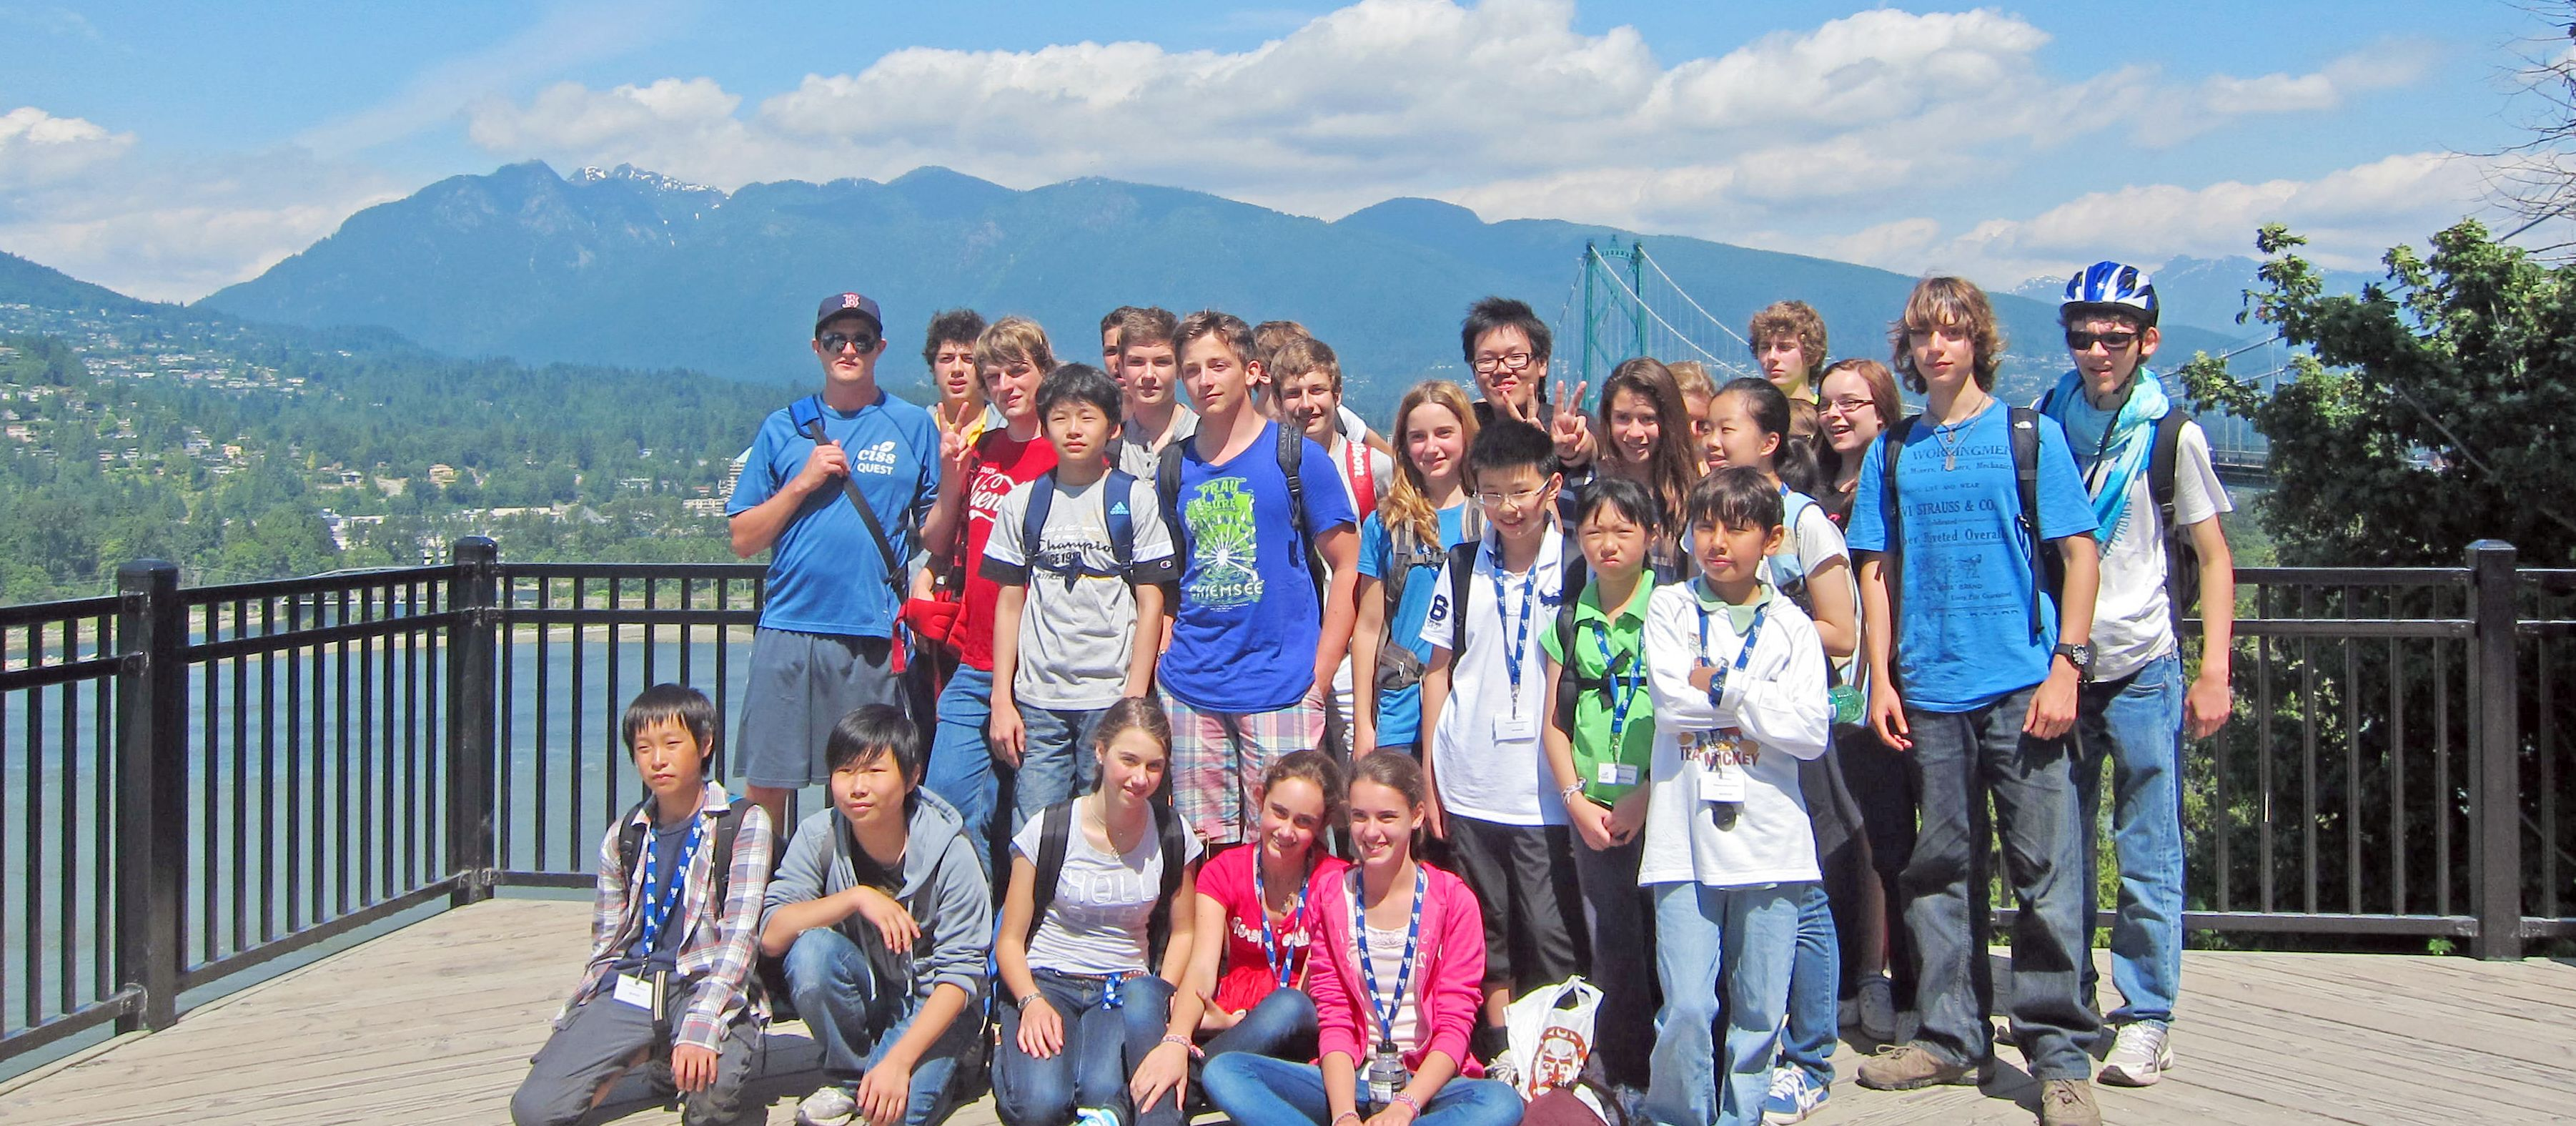 Impression Sommercamp CISS at Quest U